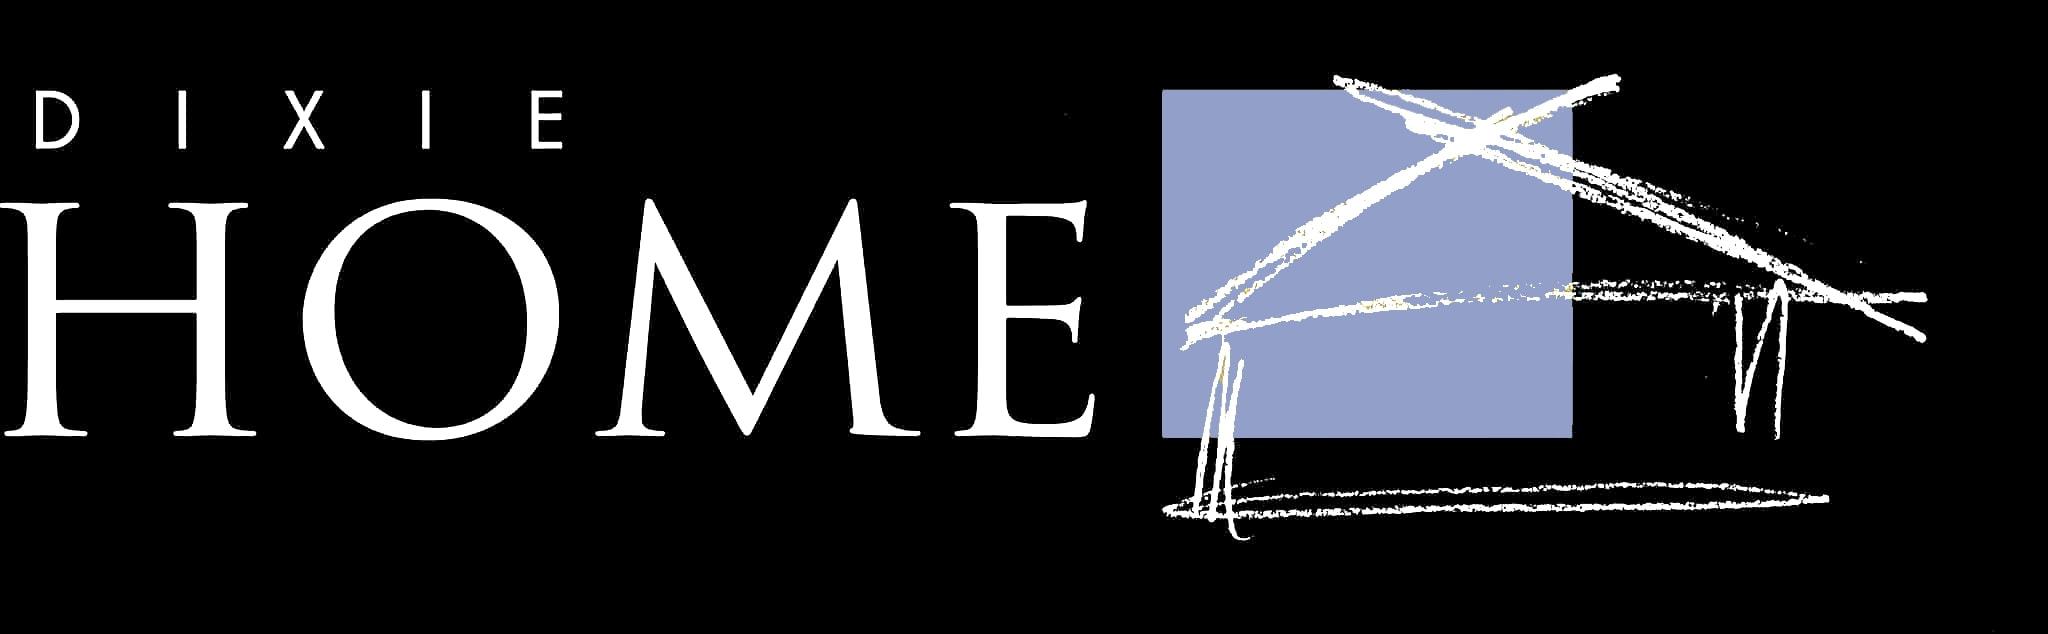 Dixie Home 2 1 Orig